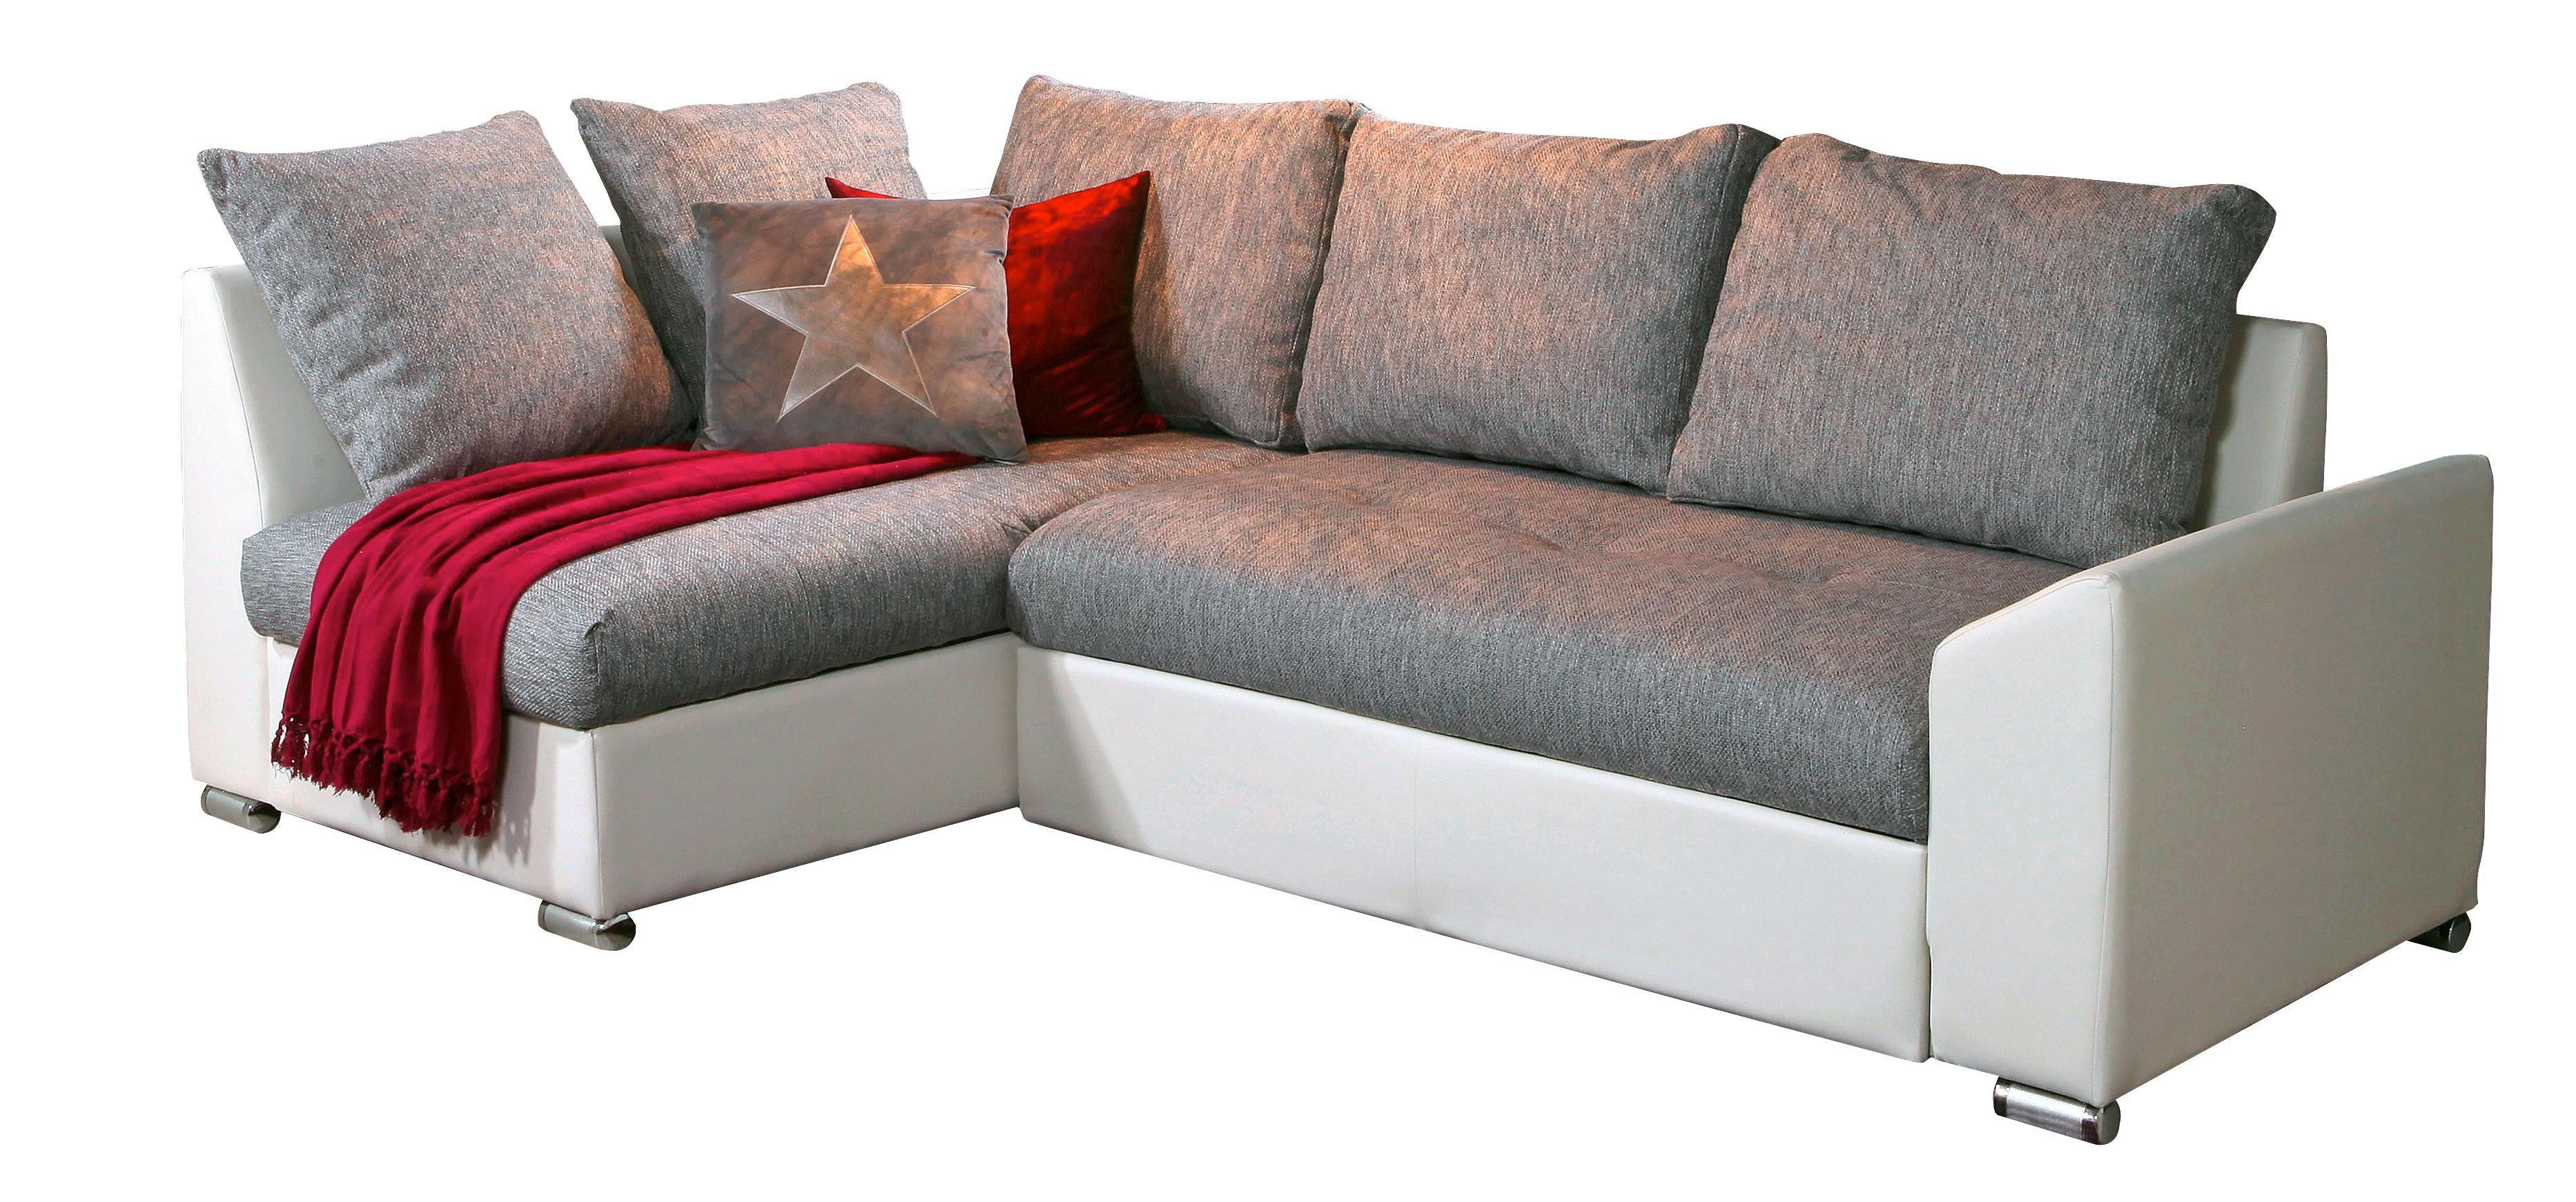 SEDEŽNA GARNITURA - siva/bela, Design, kovina/tekstil (240/150cm) - BOXXX